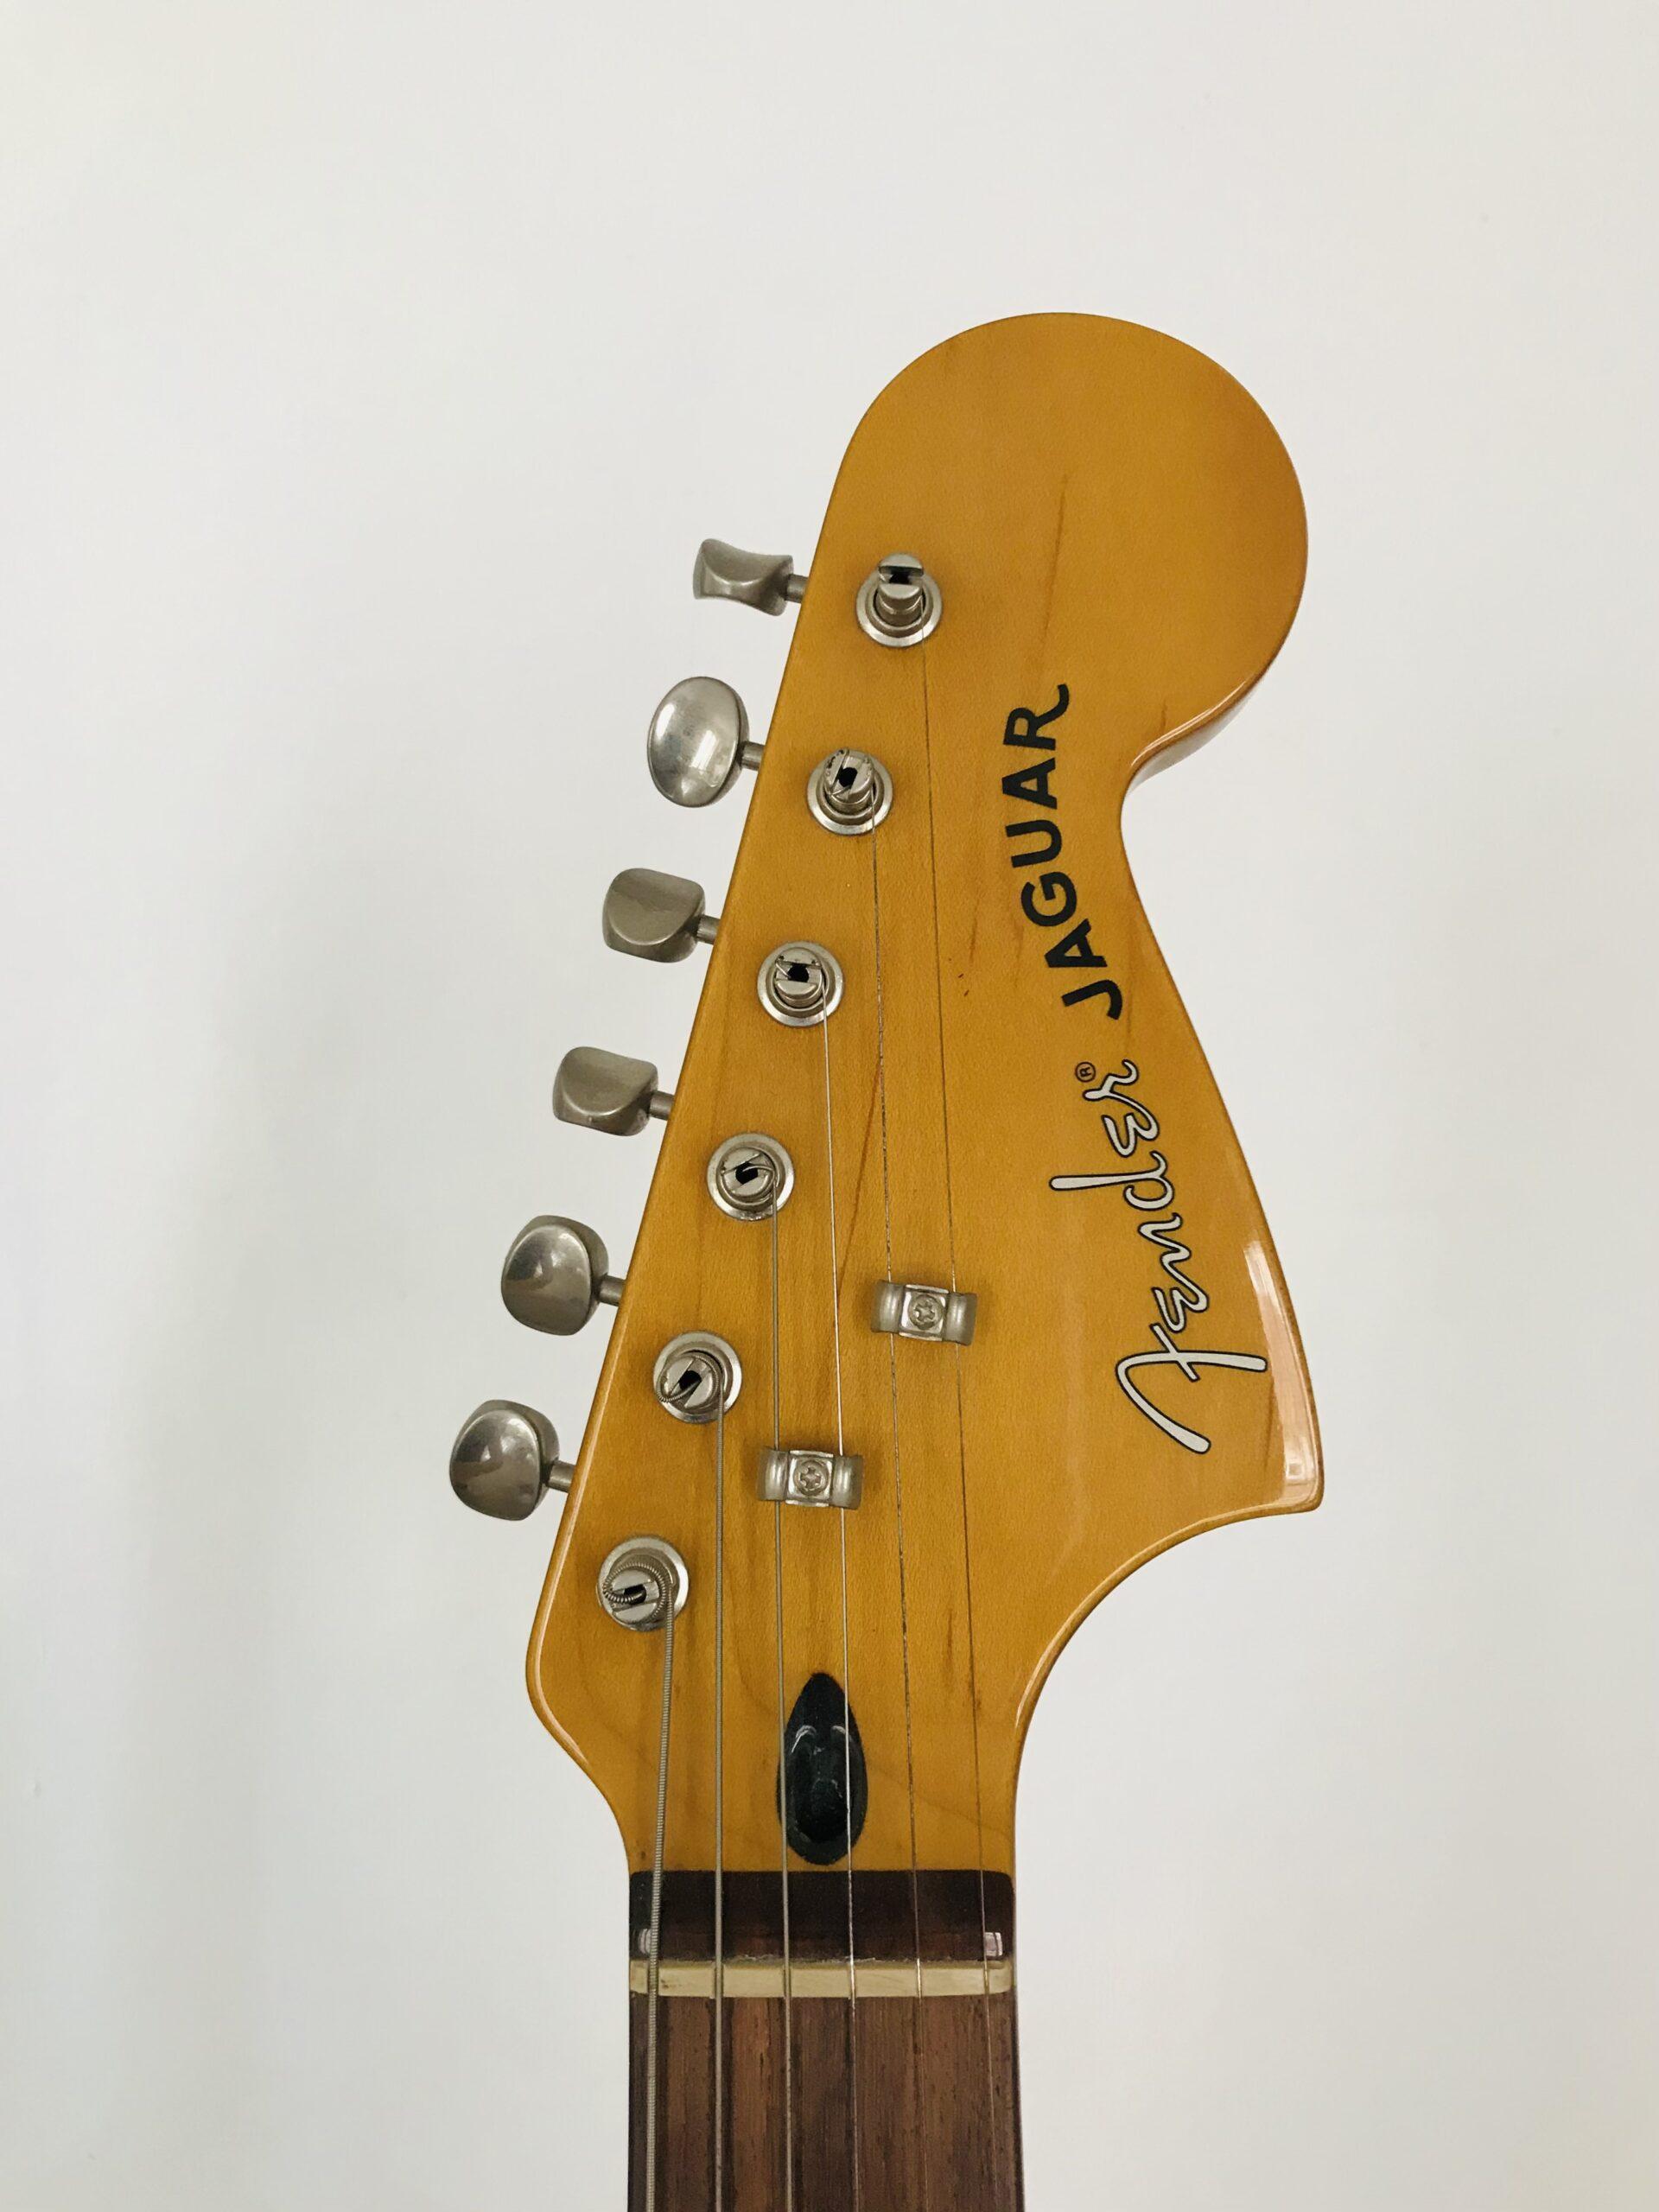 Fender Jaguar - 12 Tree Studios